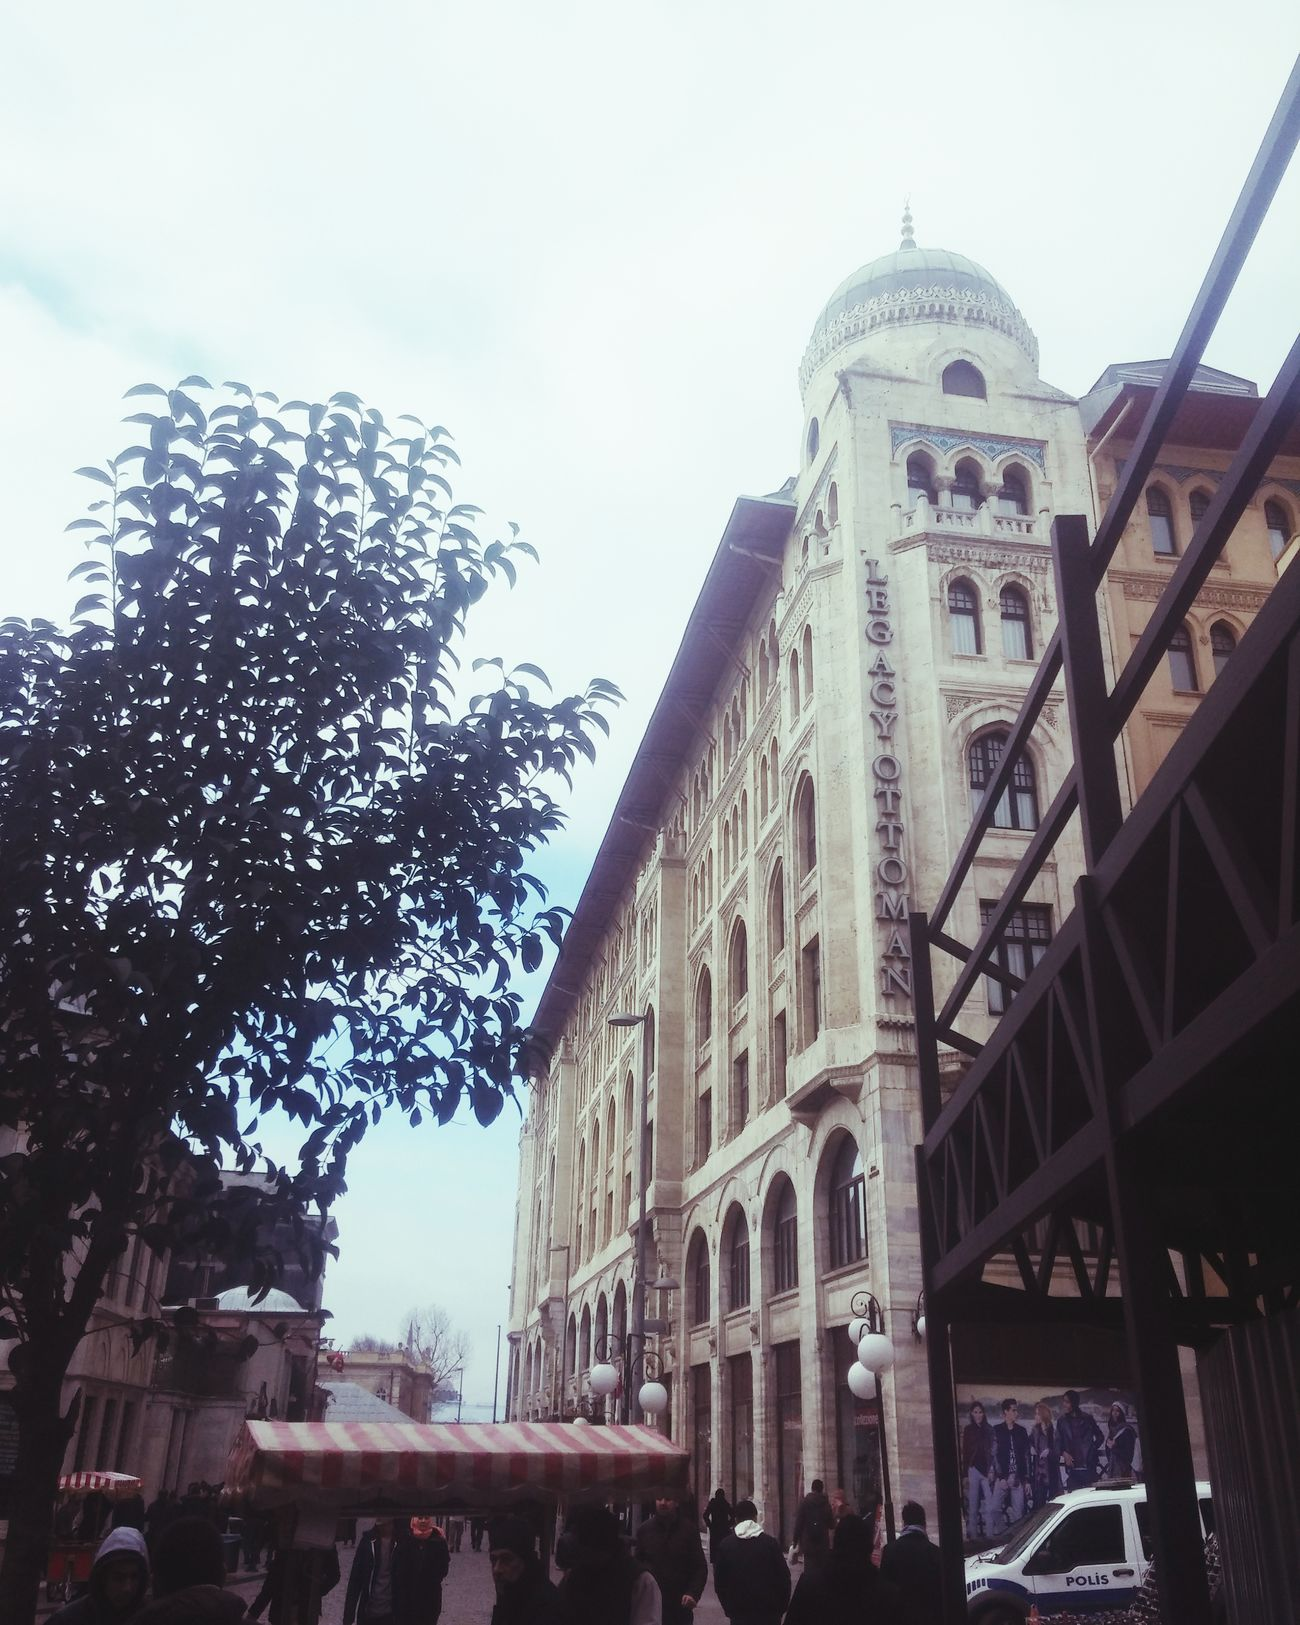 Legacyottomanhotel Sirkeci Historical Building Vscoistanbul VSCO Vscocam Today Tree People